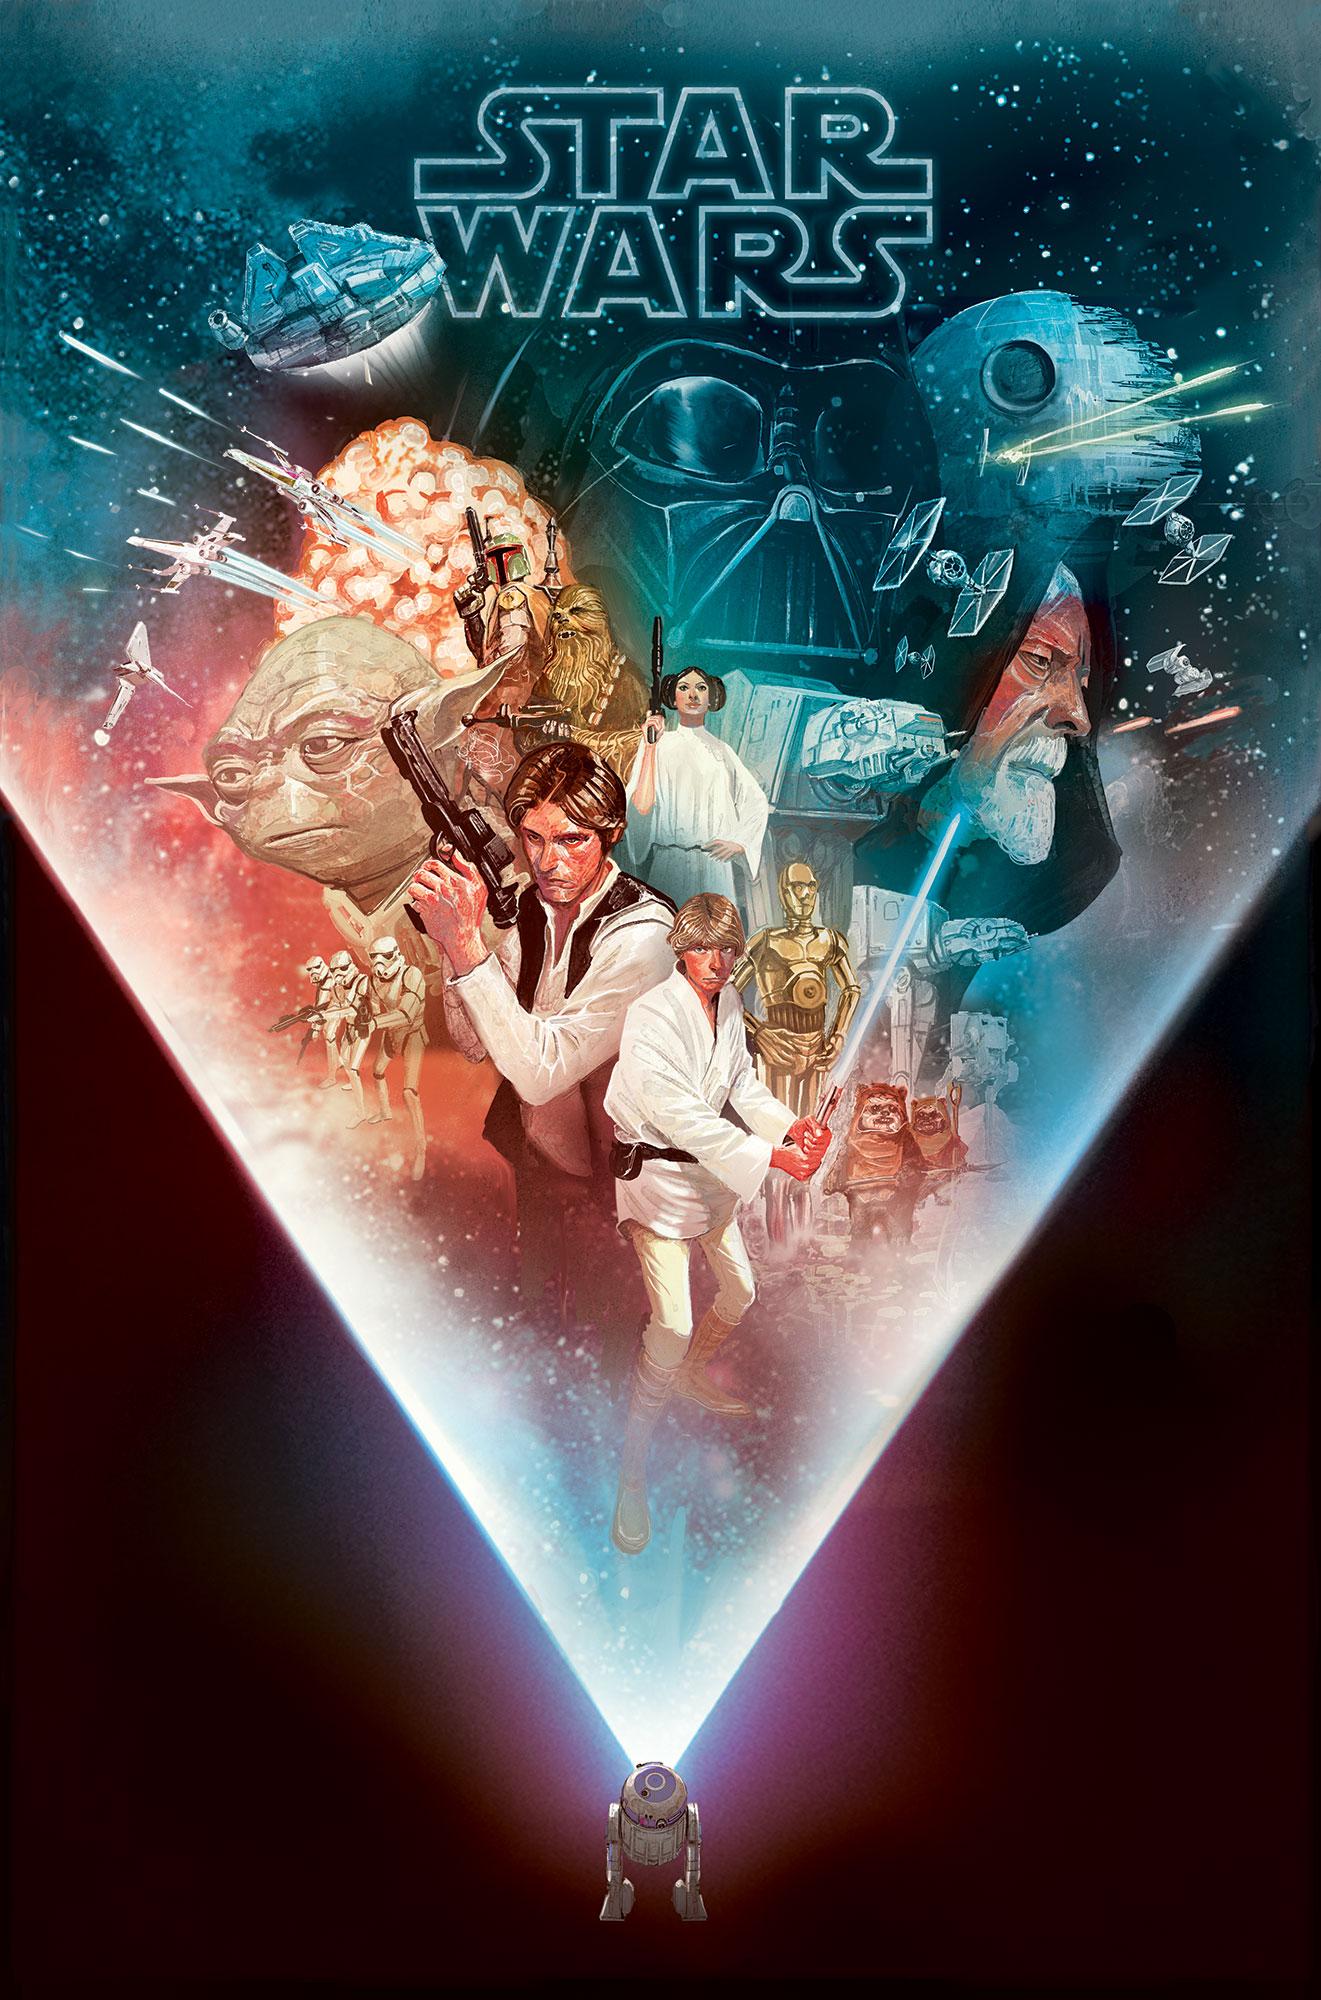 Star Wars #1 (EMP Museum Exclusive) (2015)